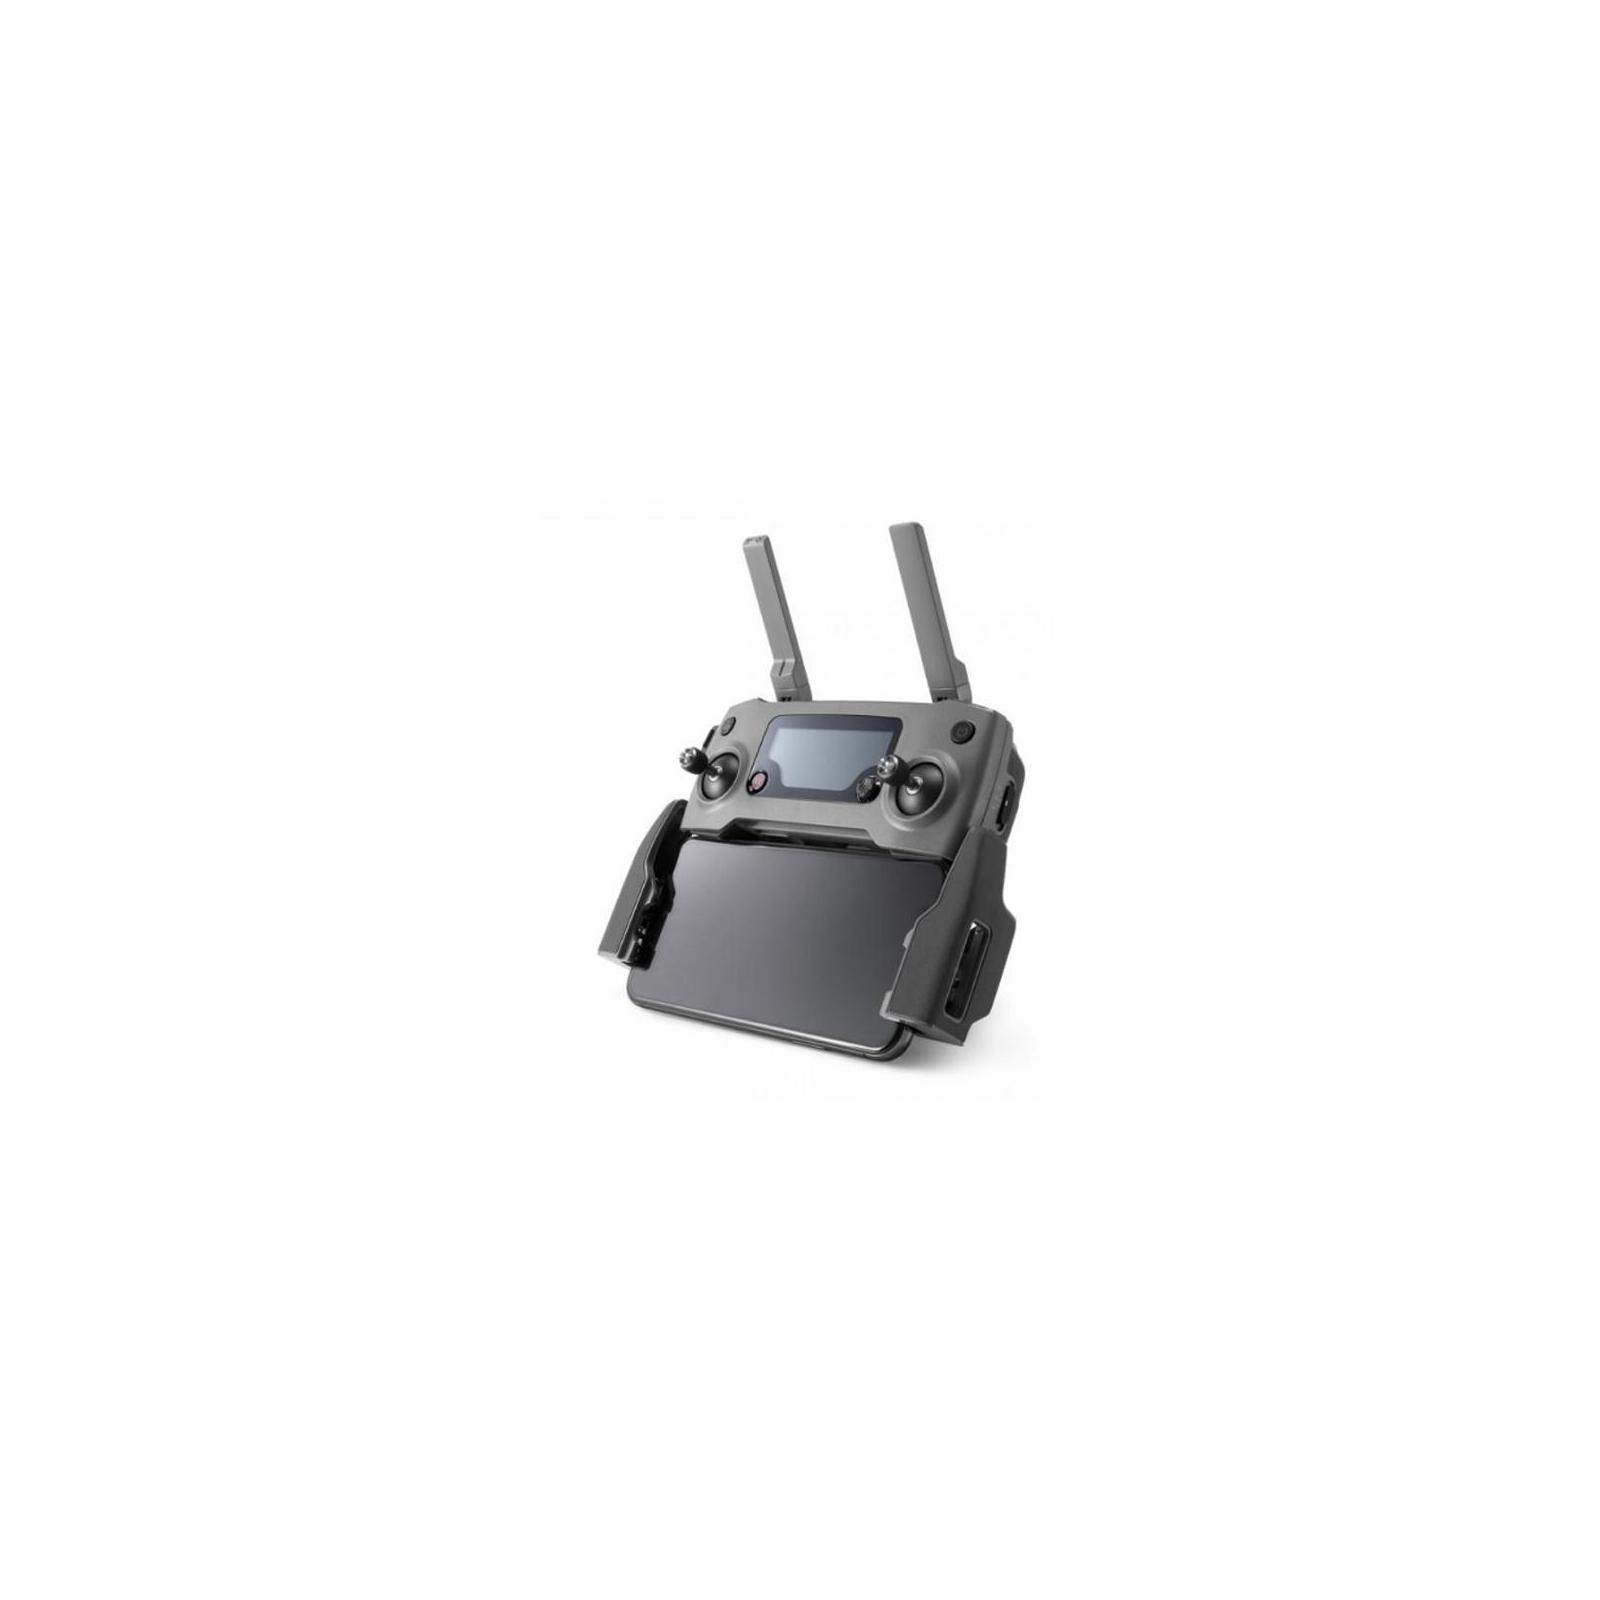 Квадрокоптер DJI Mavic 2 Pro (CP.MA.00000013.01) изображение 7